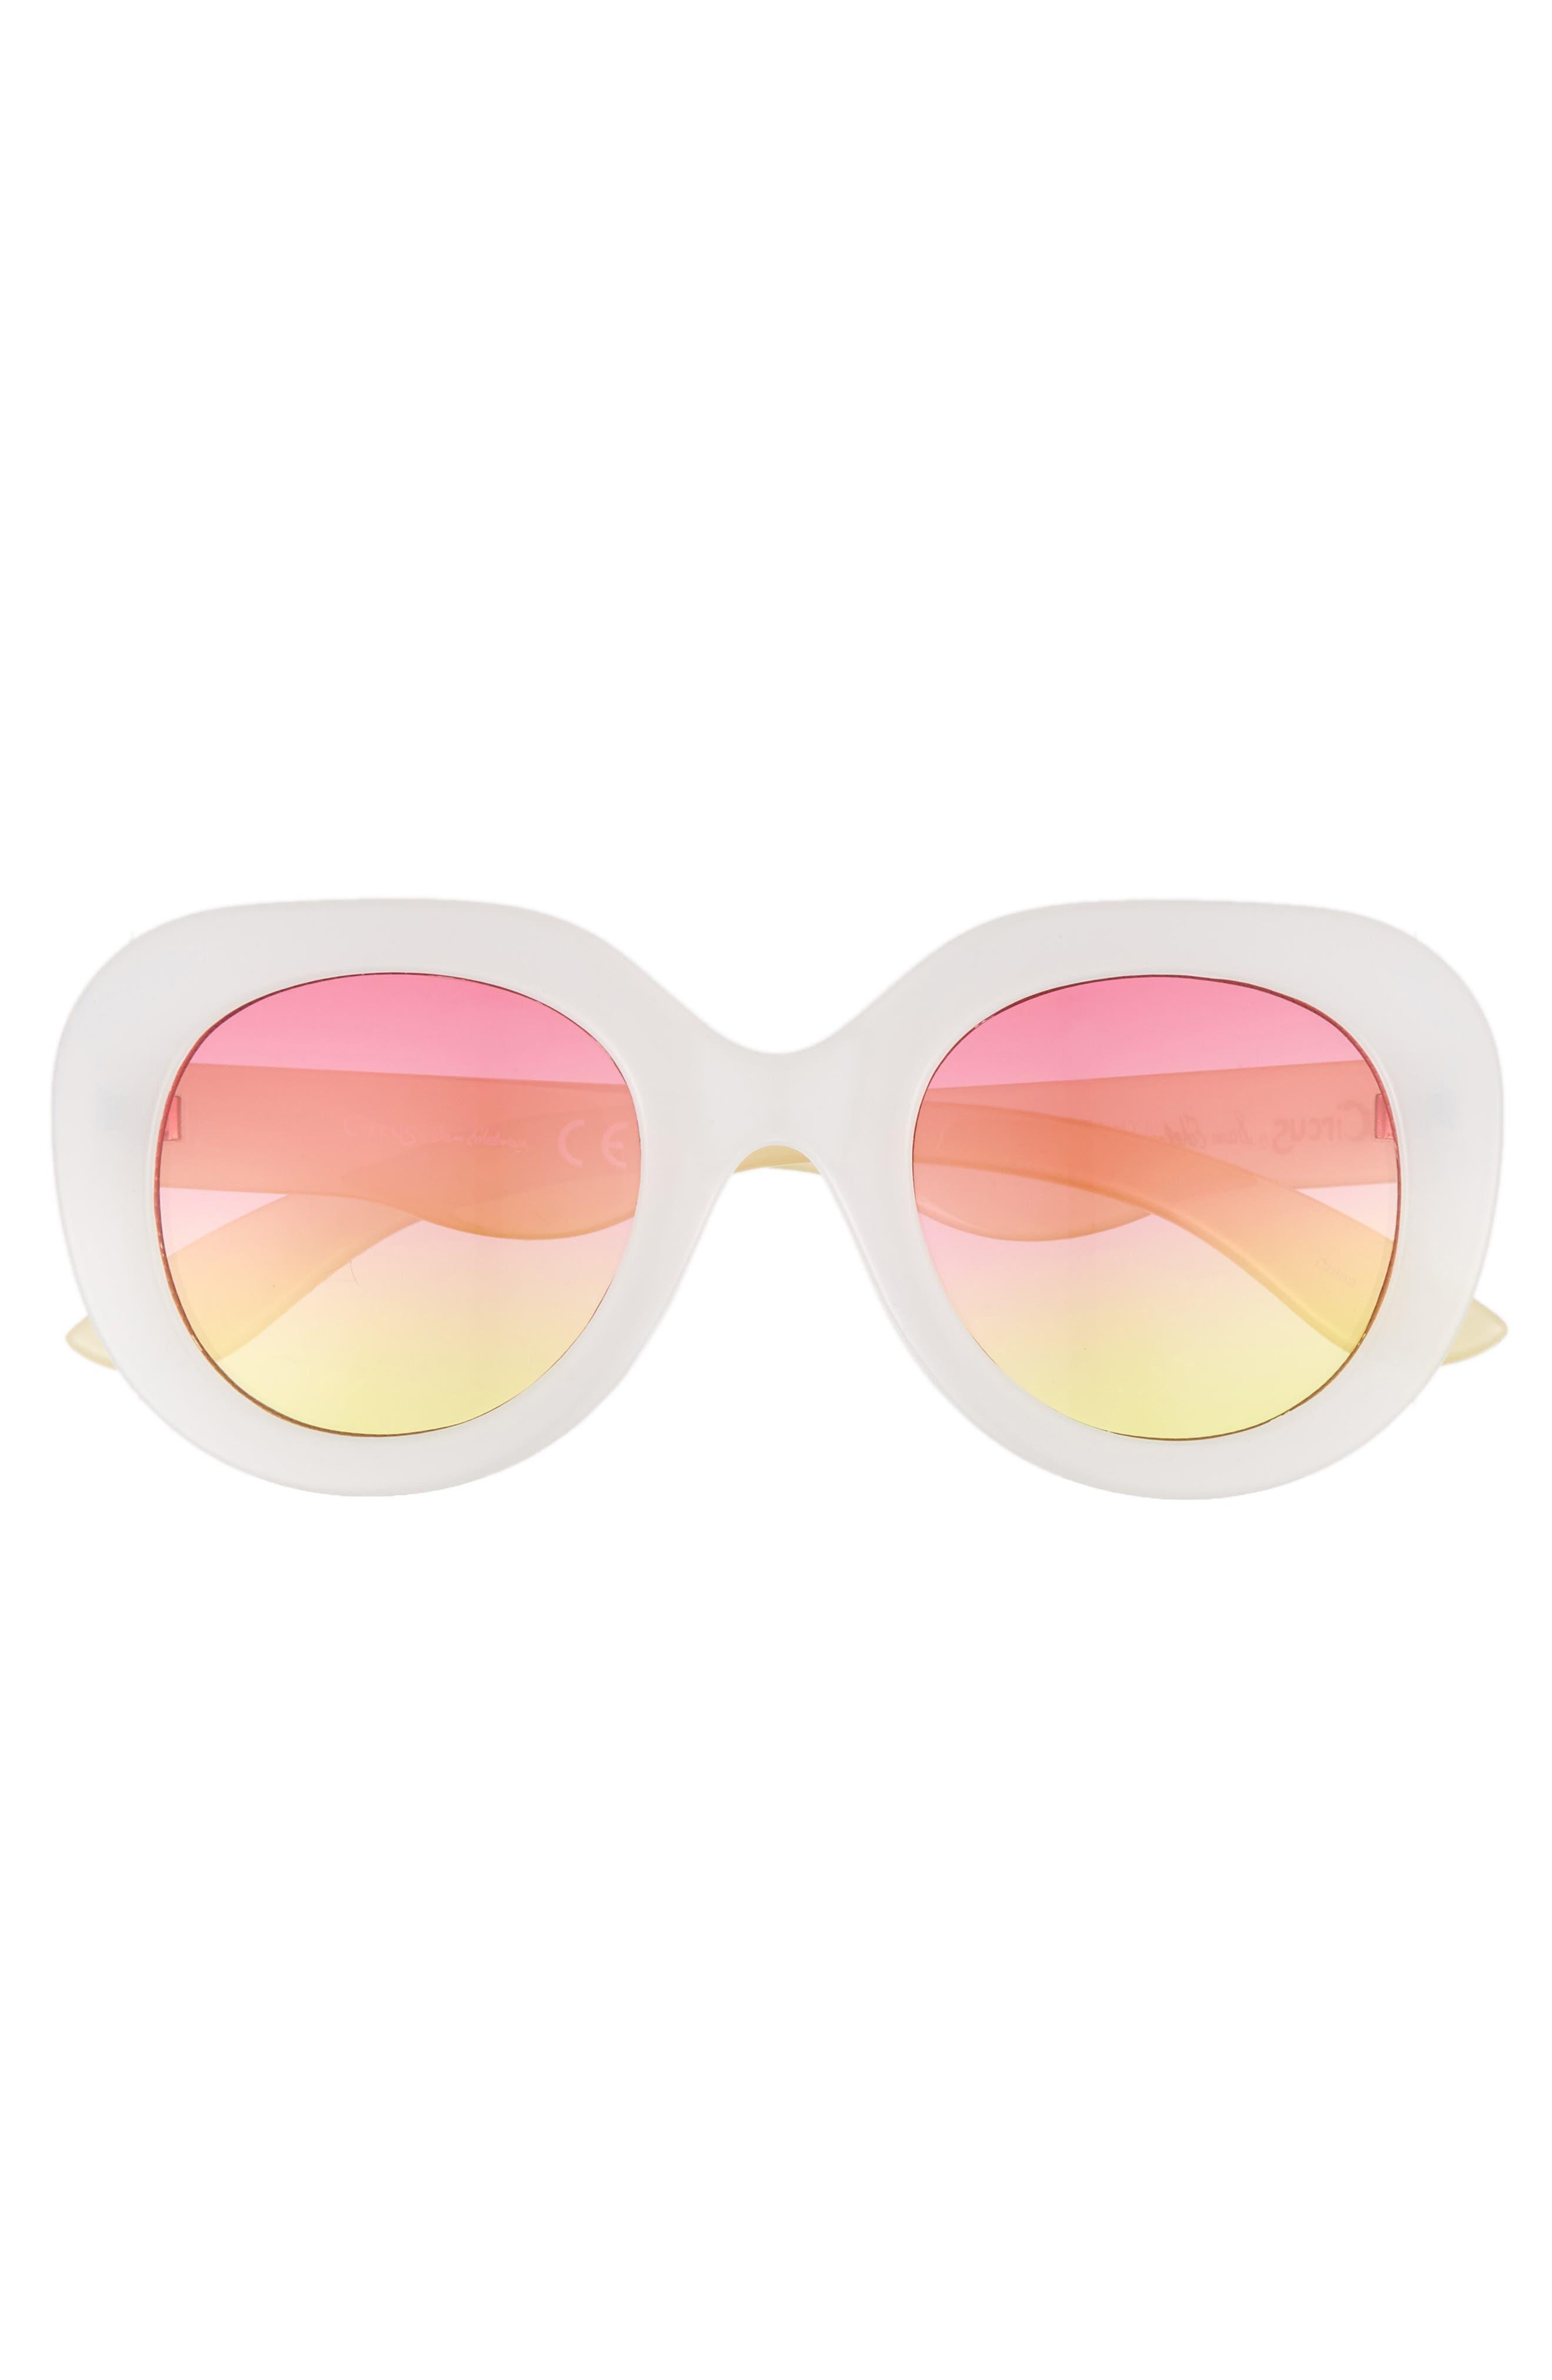 45mm Round Sunglasses,                             Alternate thumbnail 3, color,                             White/ Yellow